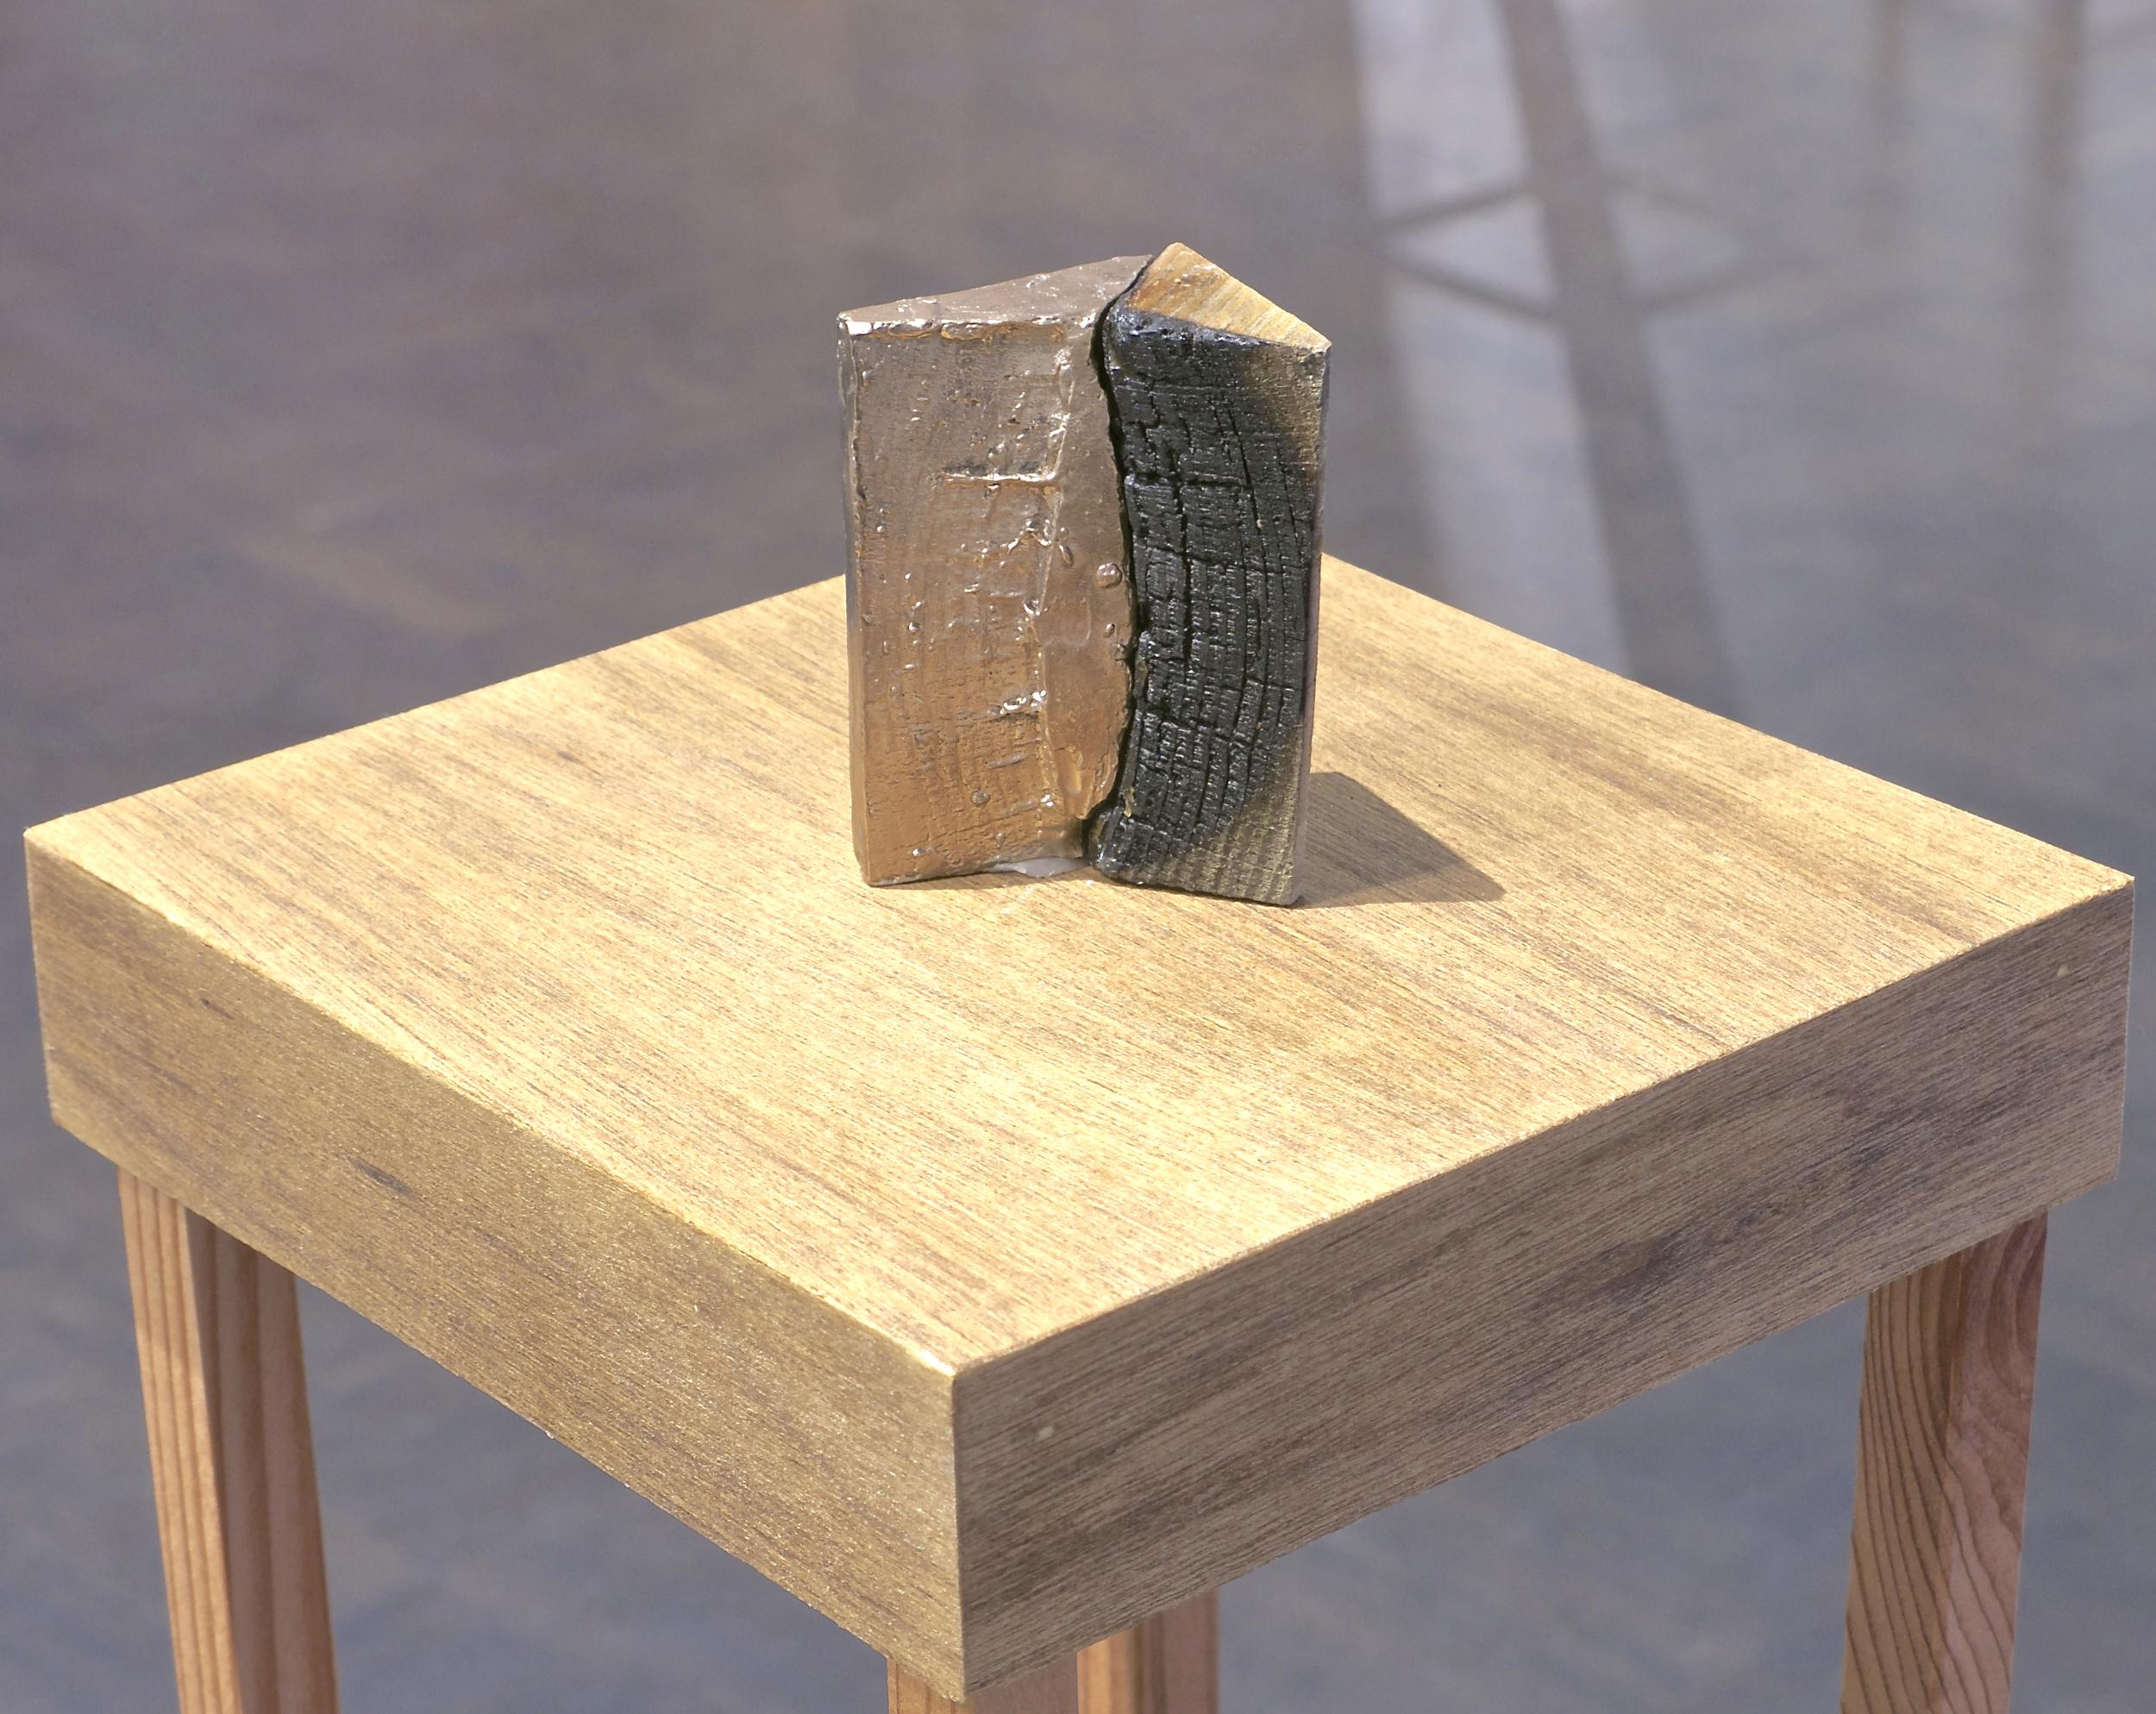 "Broken #4 | H. 2.5"" W. 2.5"" D. 1"" | Bronze and found object | Year 2014 | Photo: Mazdak Shadkam"